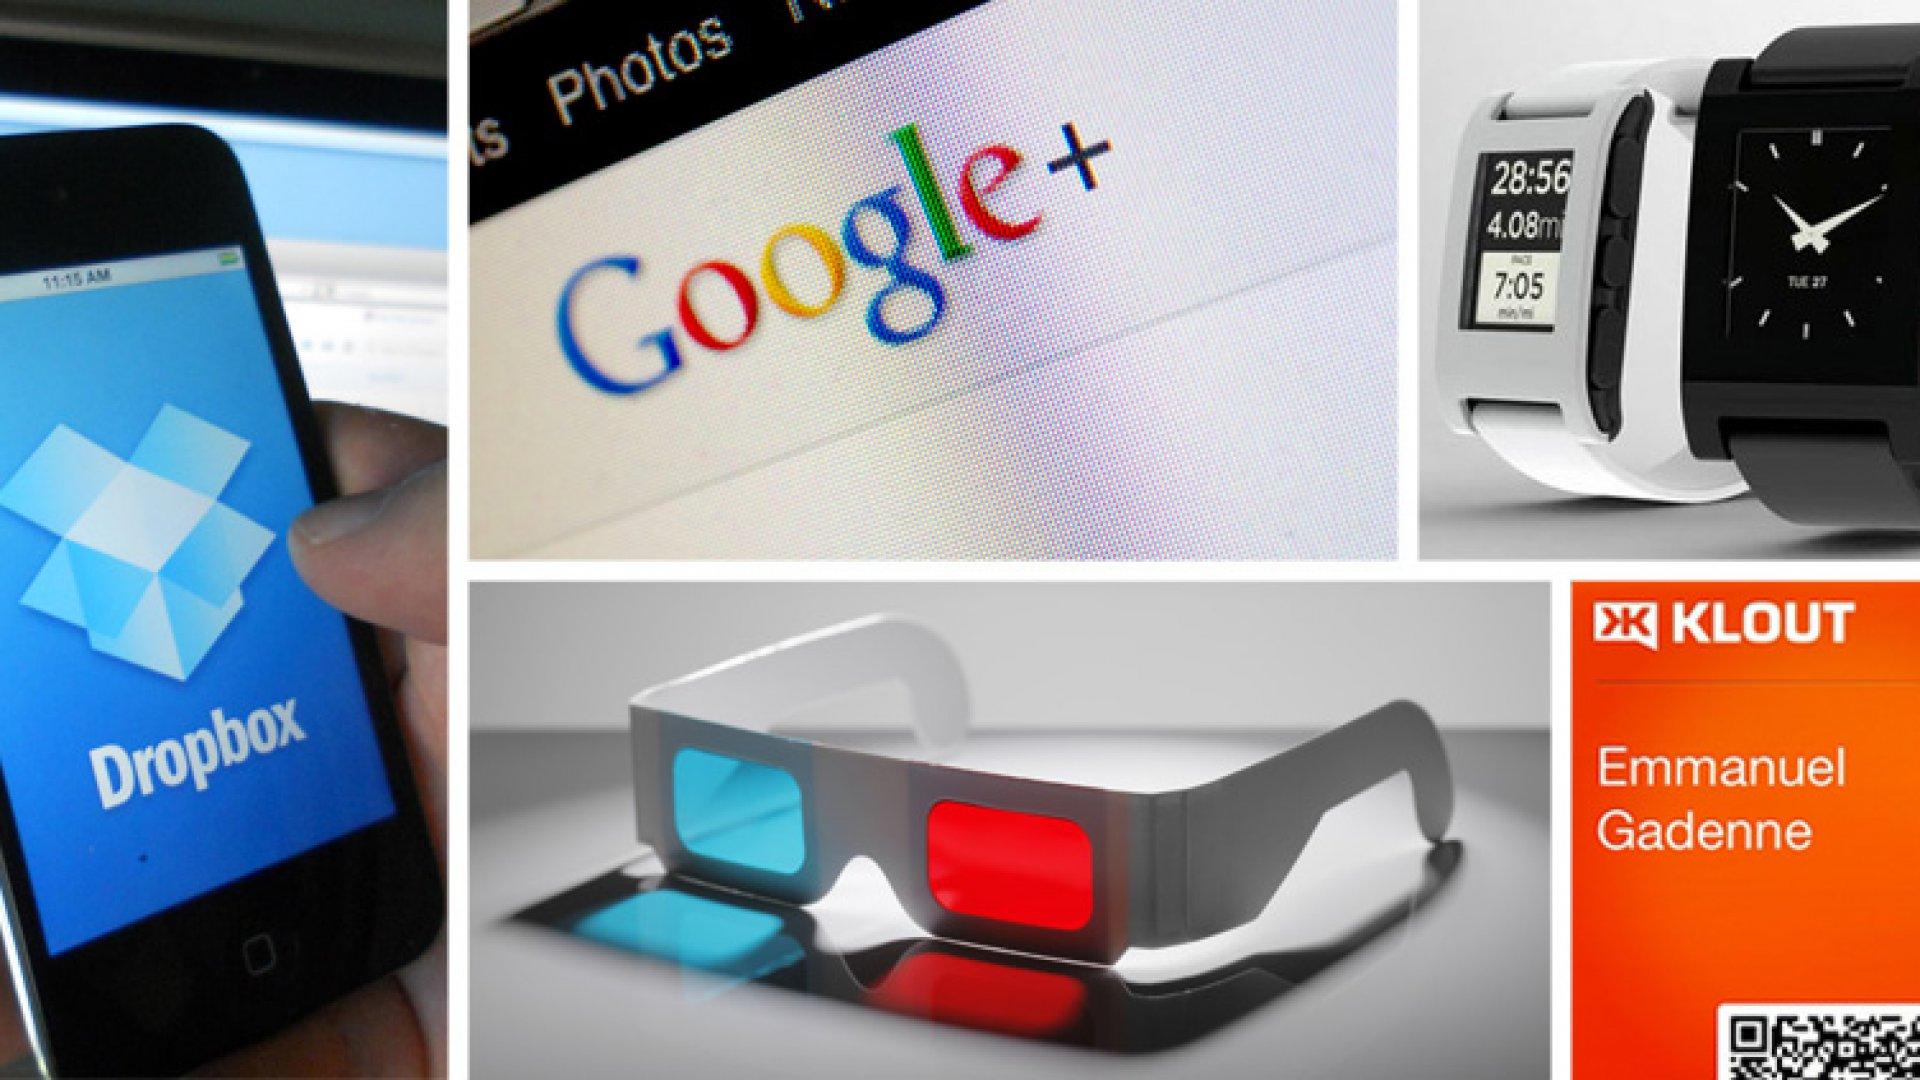 5 Epic Tech Fails in 2012